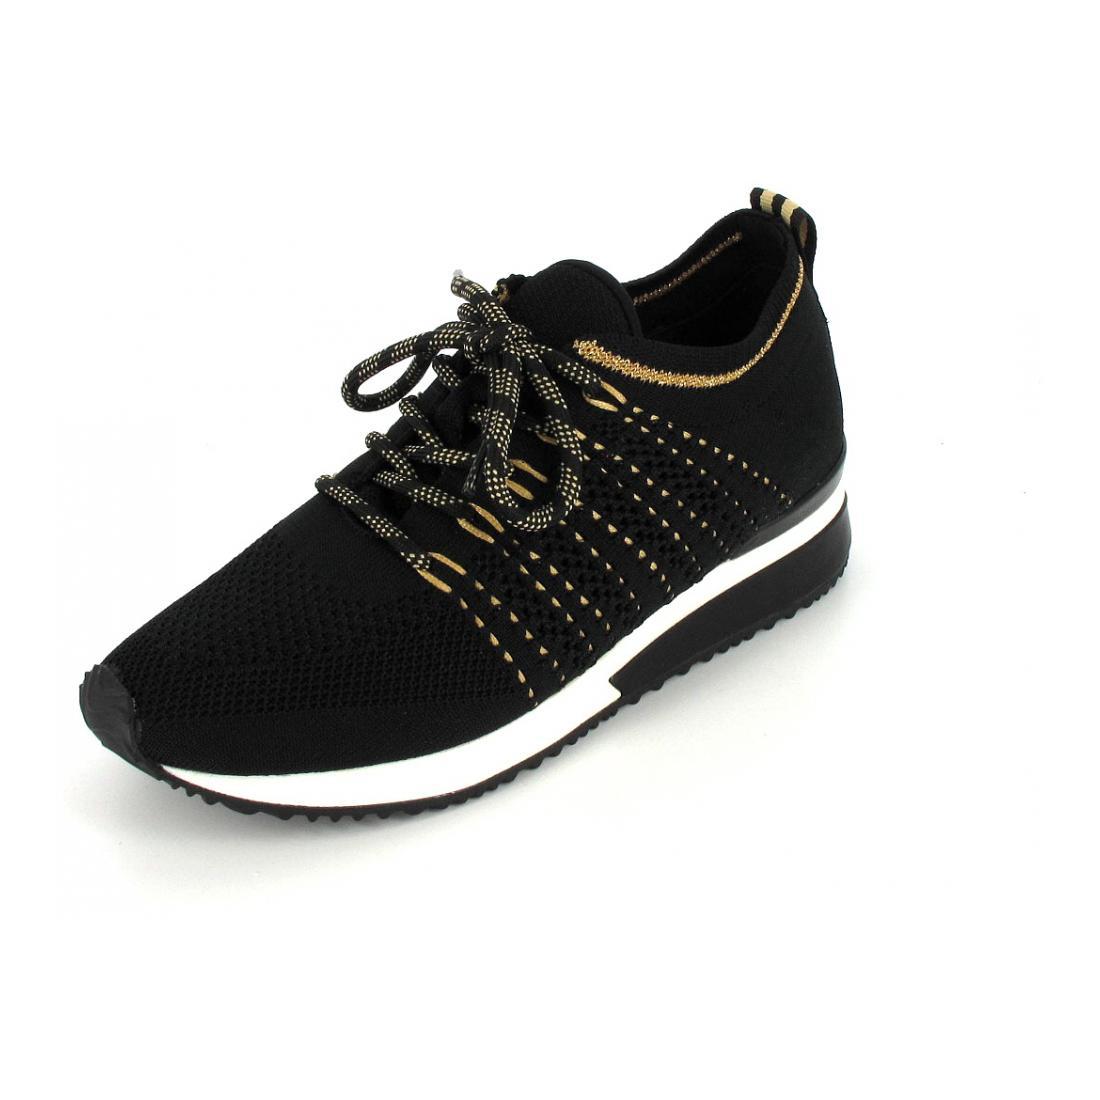 La Strada Sneaker Black Knitted